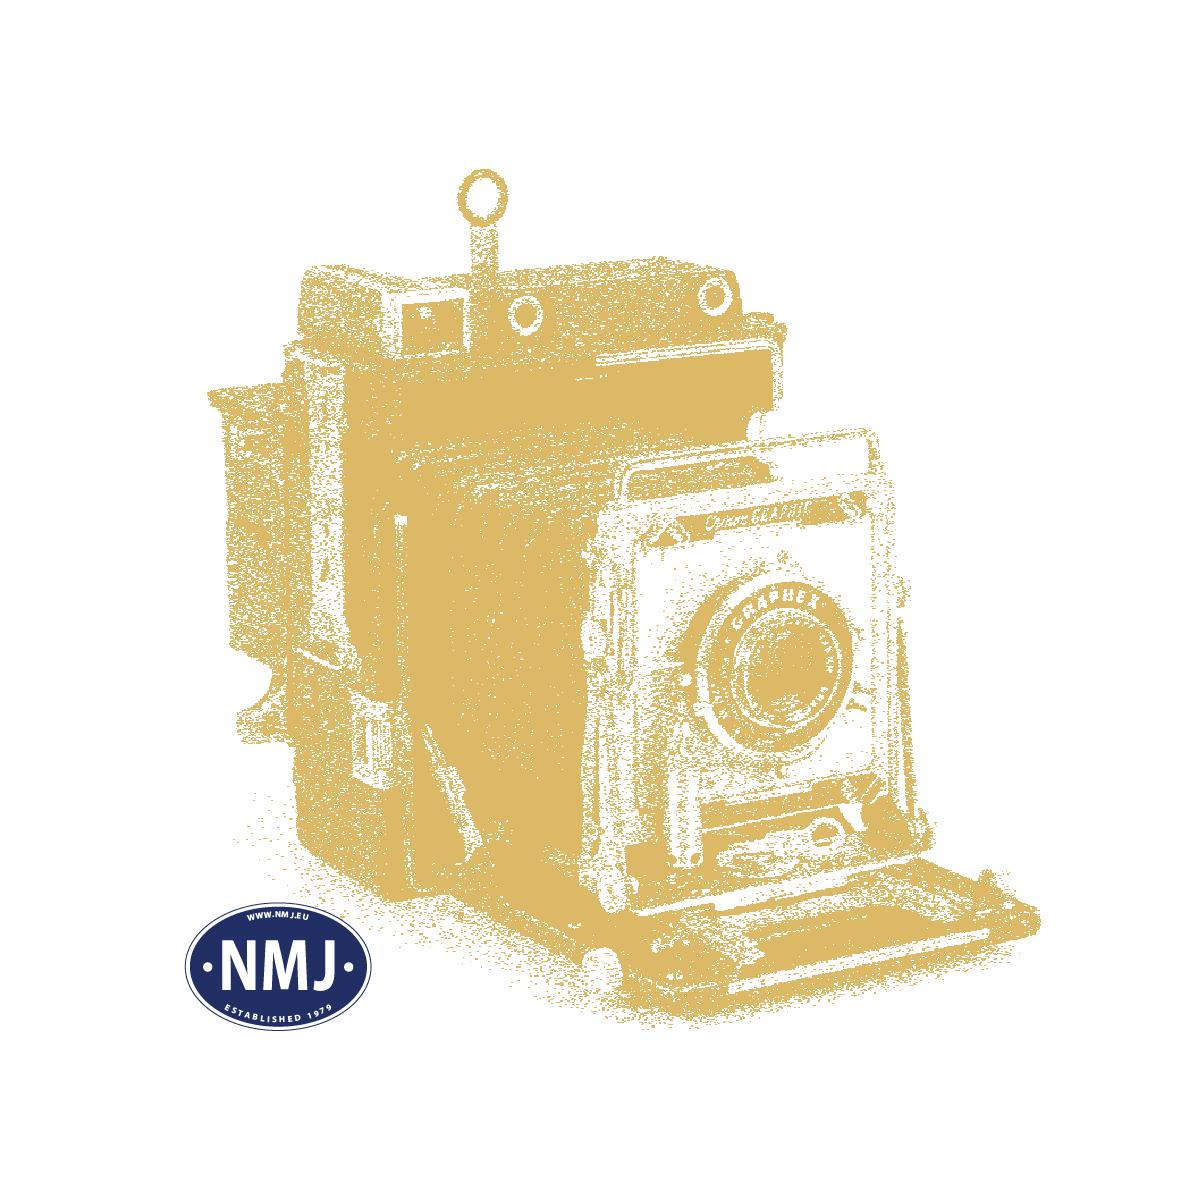 NMJH15122 - NMJ Skyline Norwegian Villa, Yellow/White, Ready-made Model